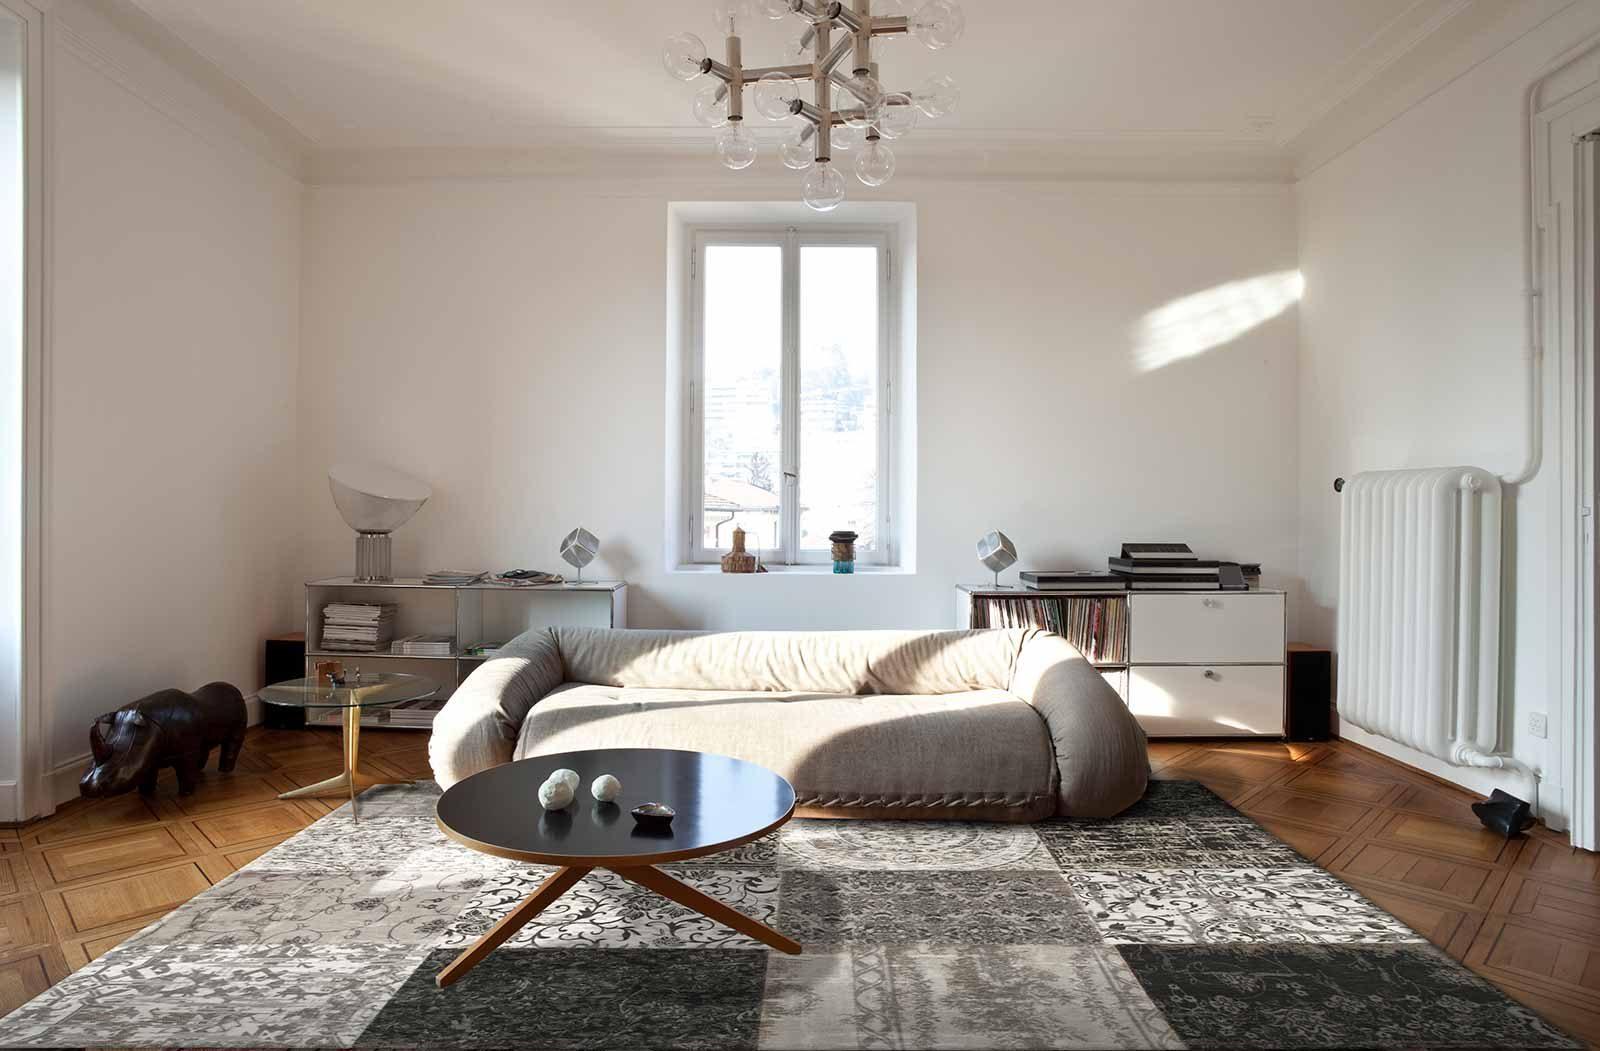 alfombras Louis De Poortere LX8101 Vintage Black White interior